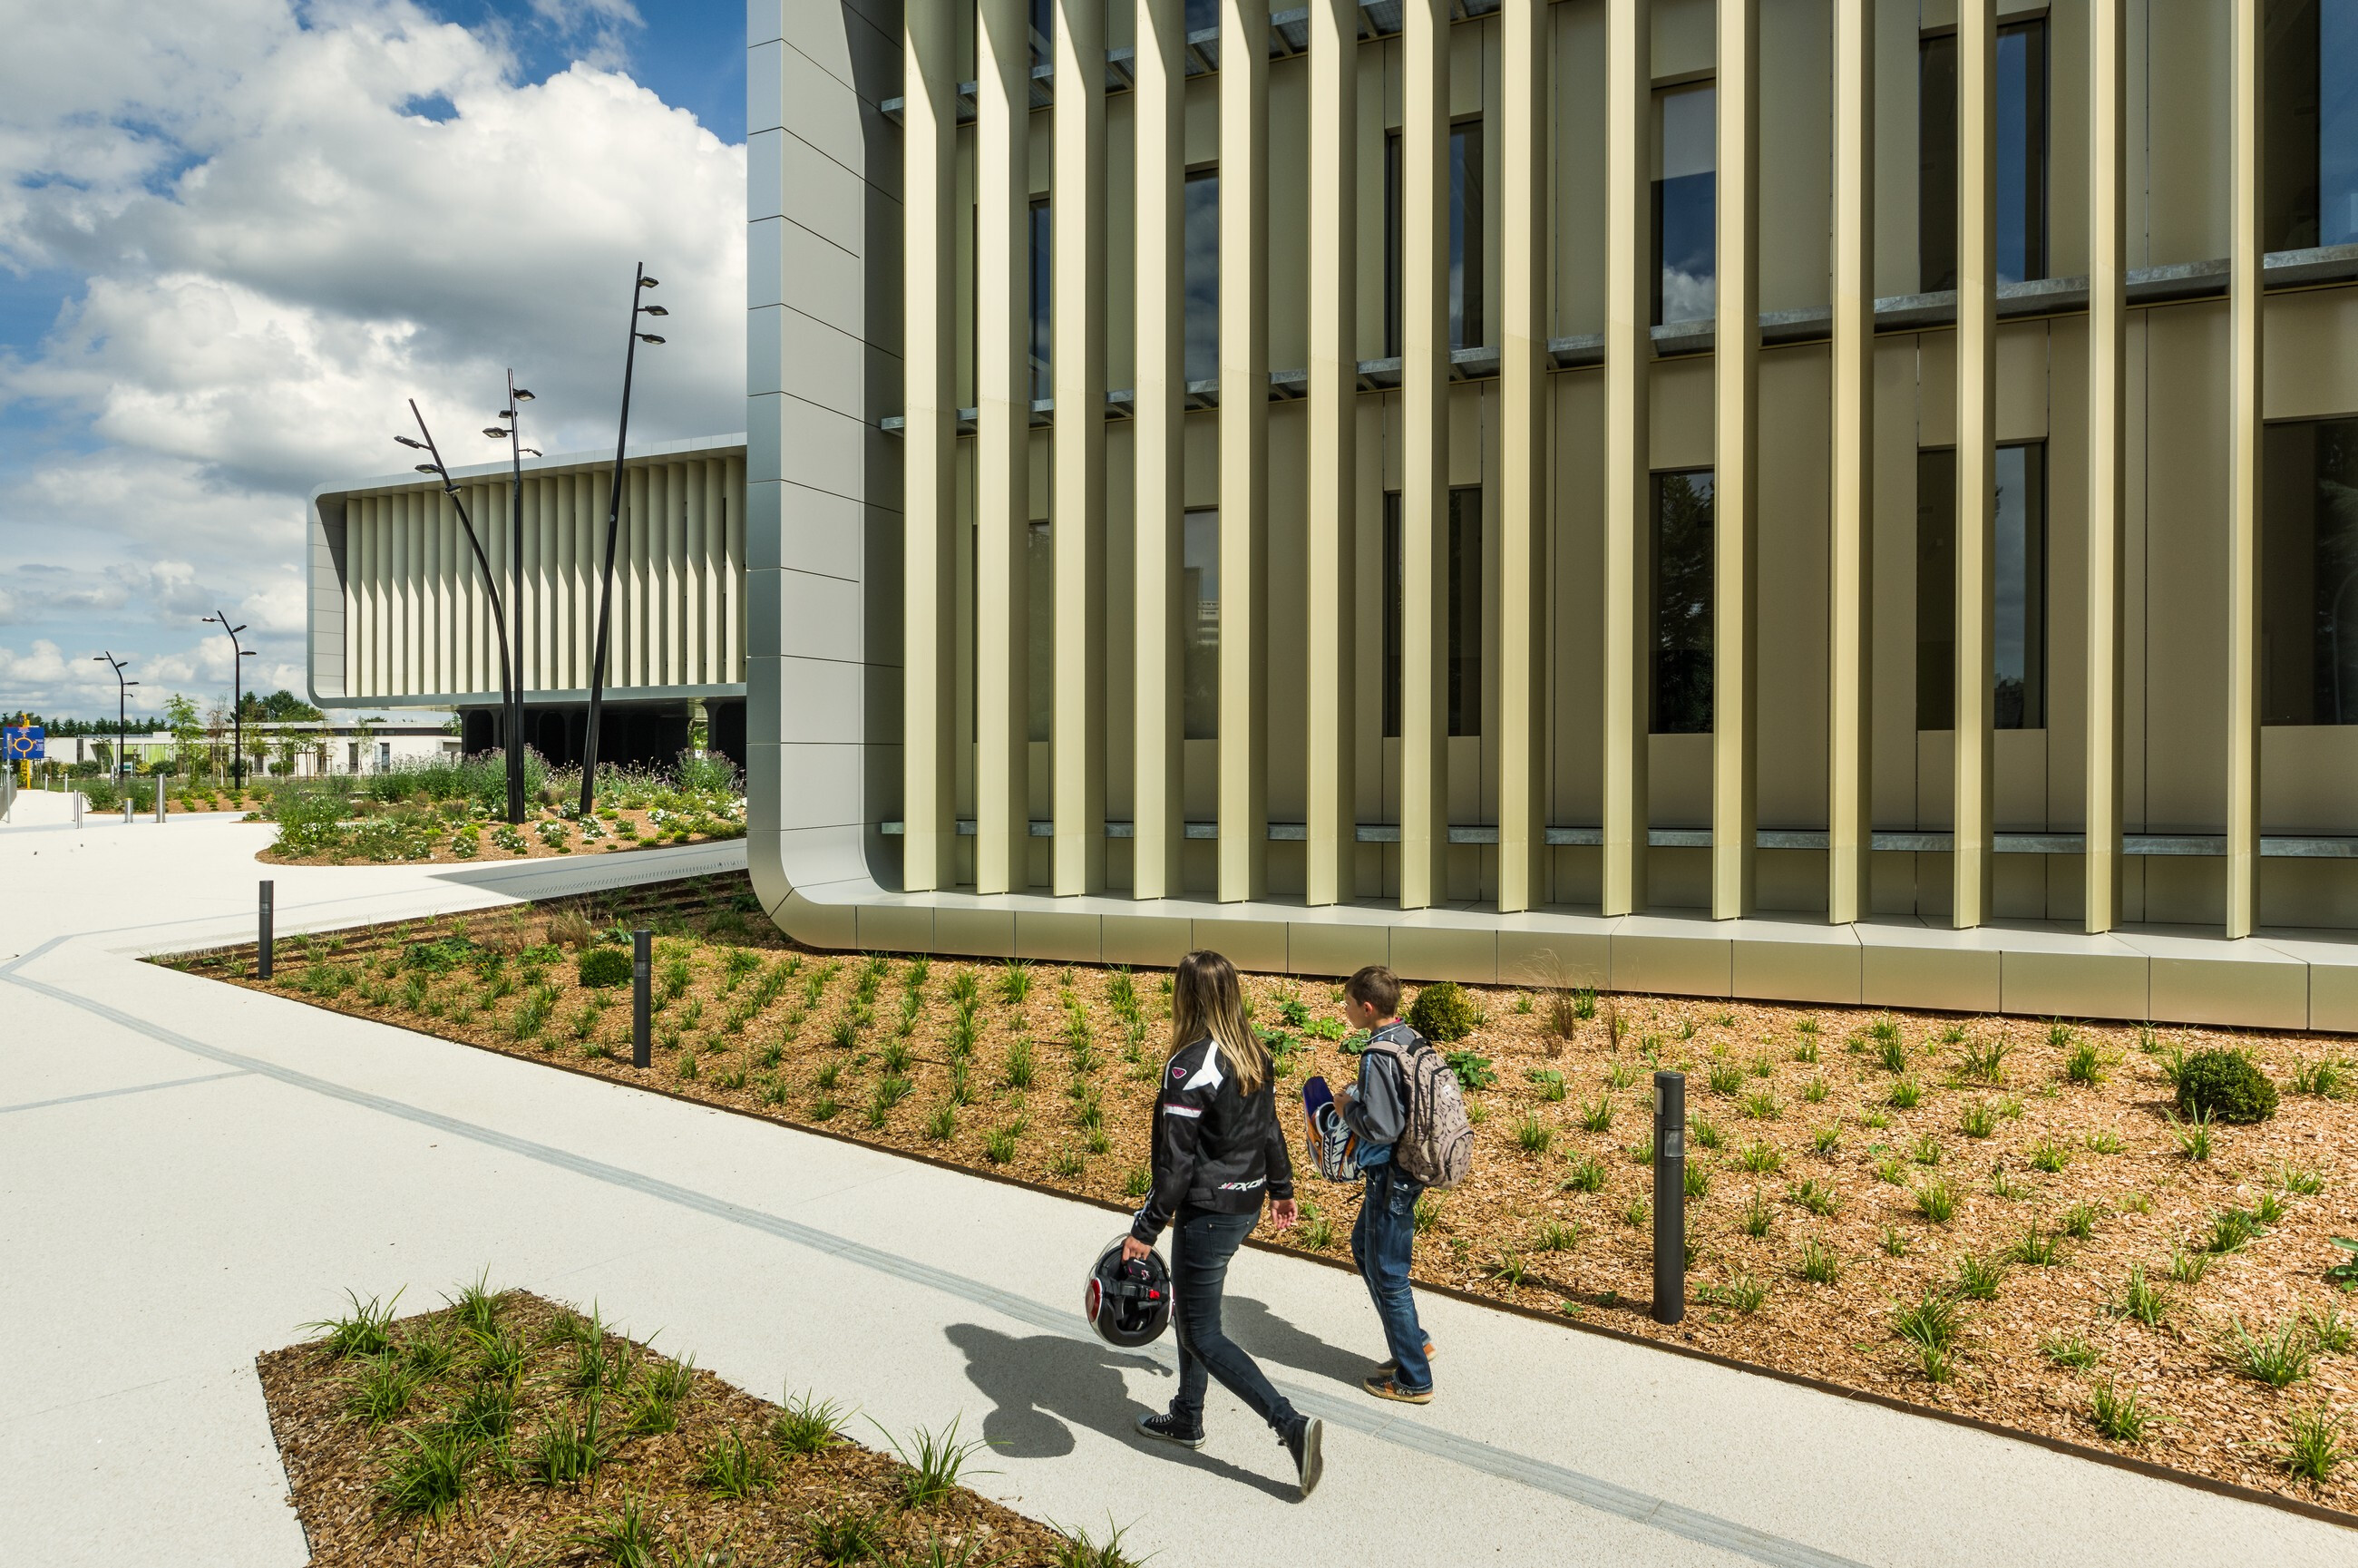 CHU of Poitiers - Administrative Center